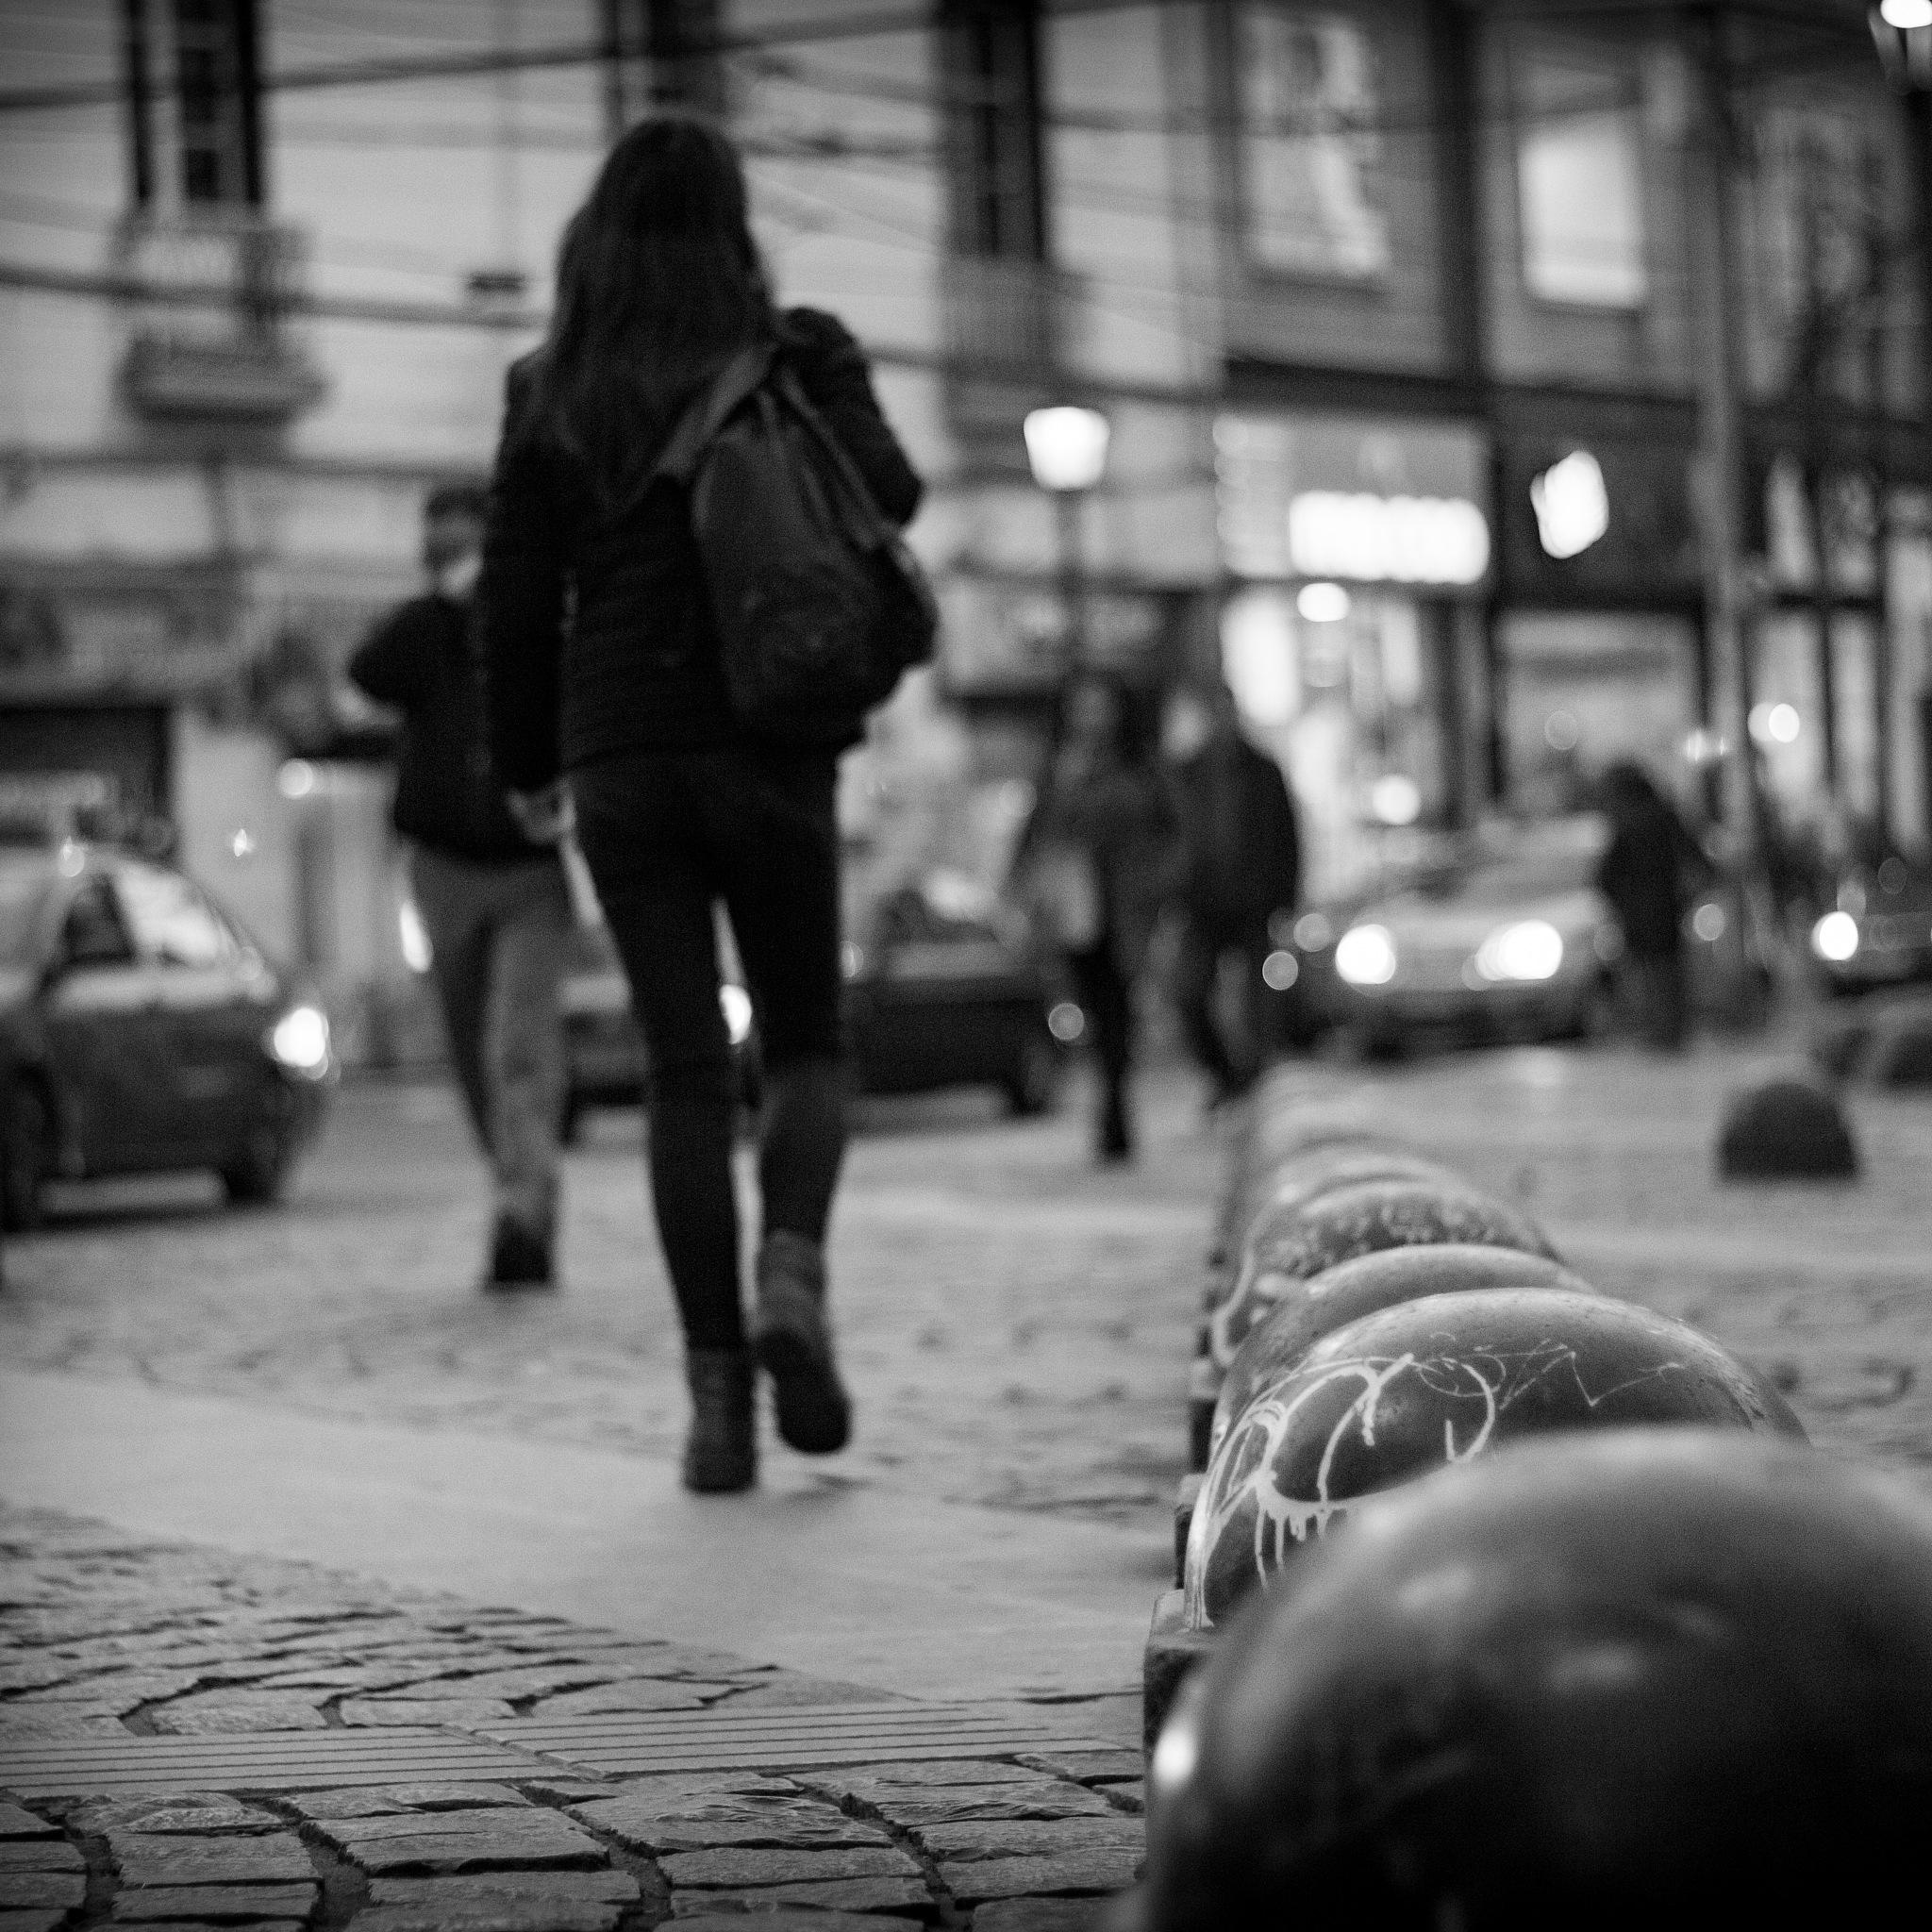 caminando por Valparaíso by fotorawmk